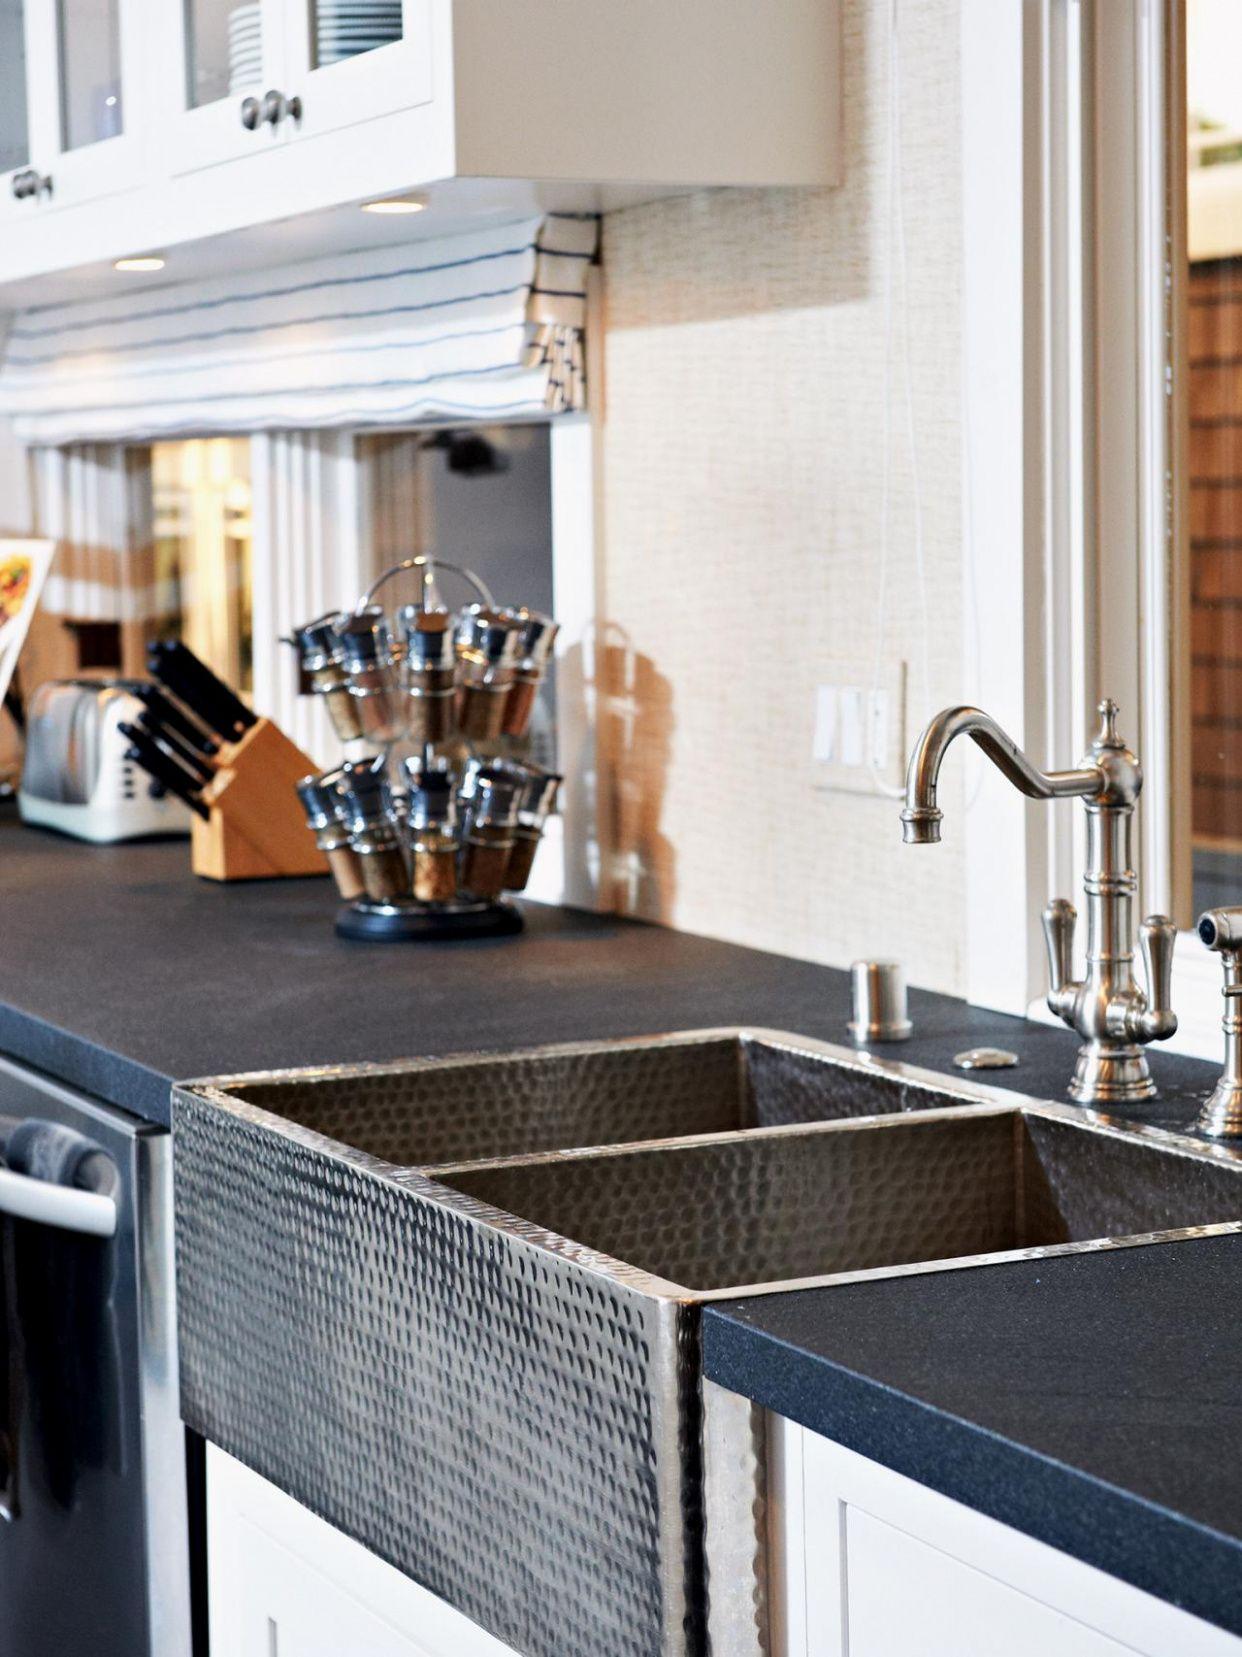 20+ Absolute Black Quartz Countertops - Kitchen Decorating ...